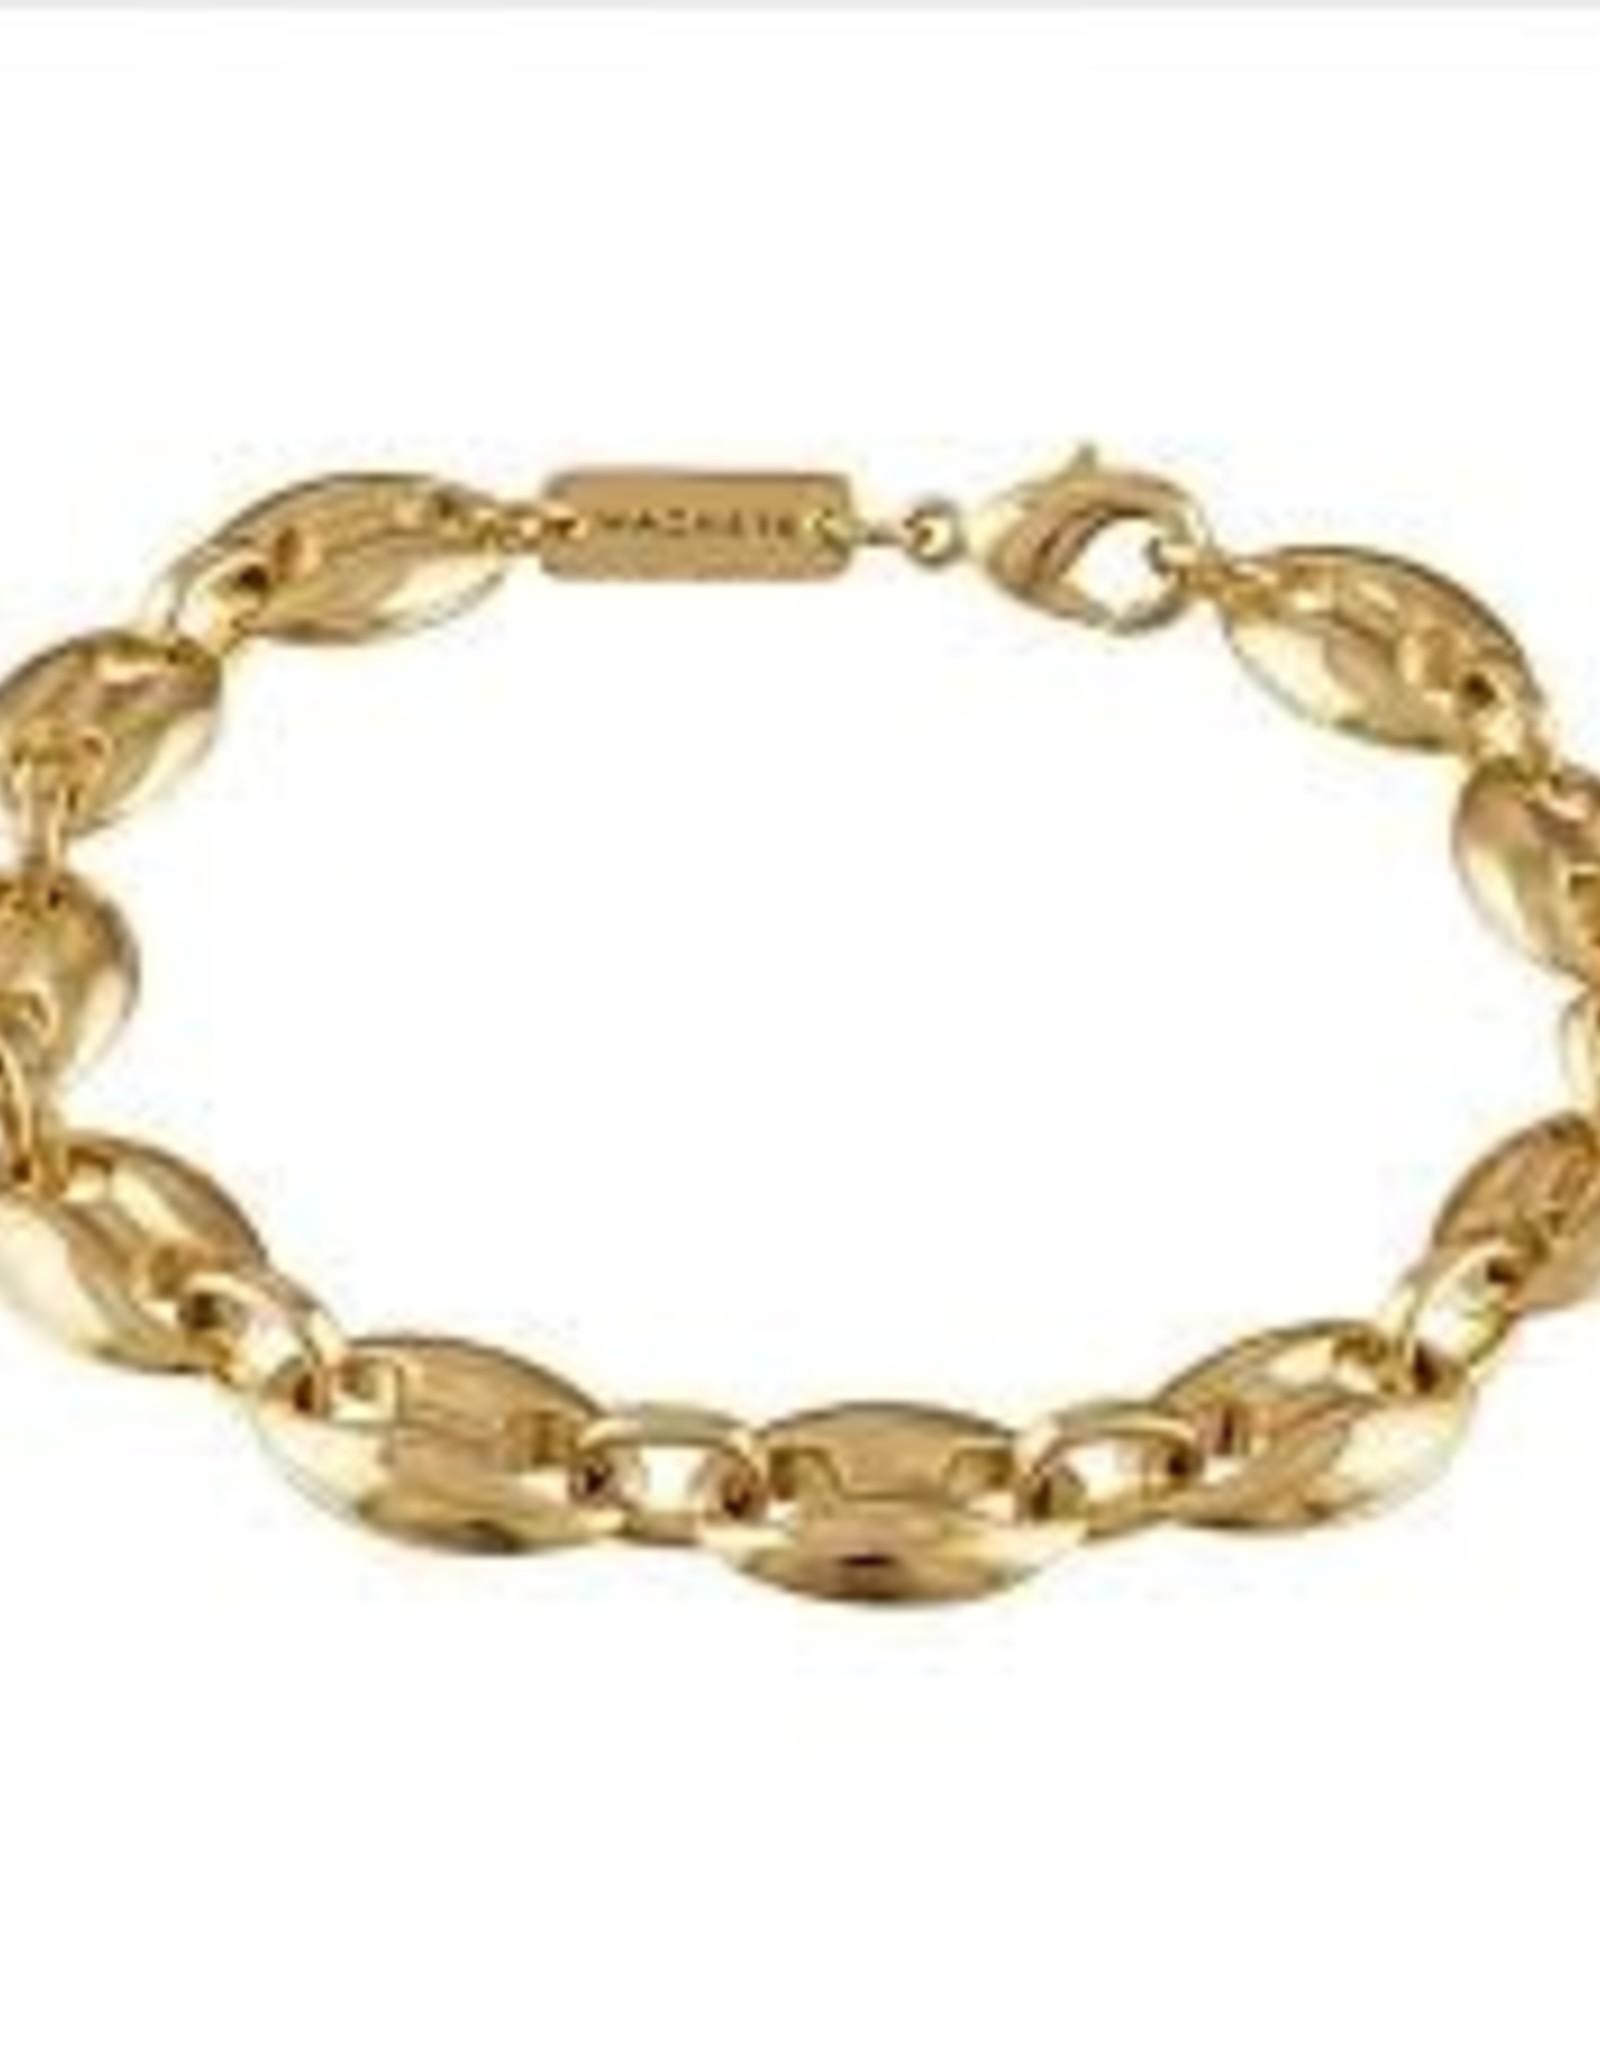 Machete Large Coffee Bean Bracelet - Gold